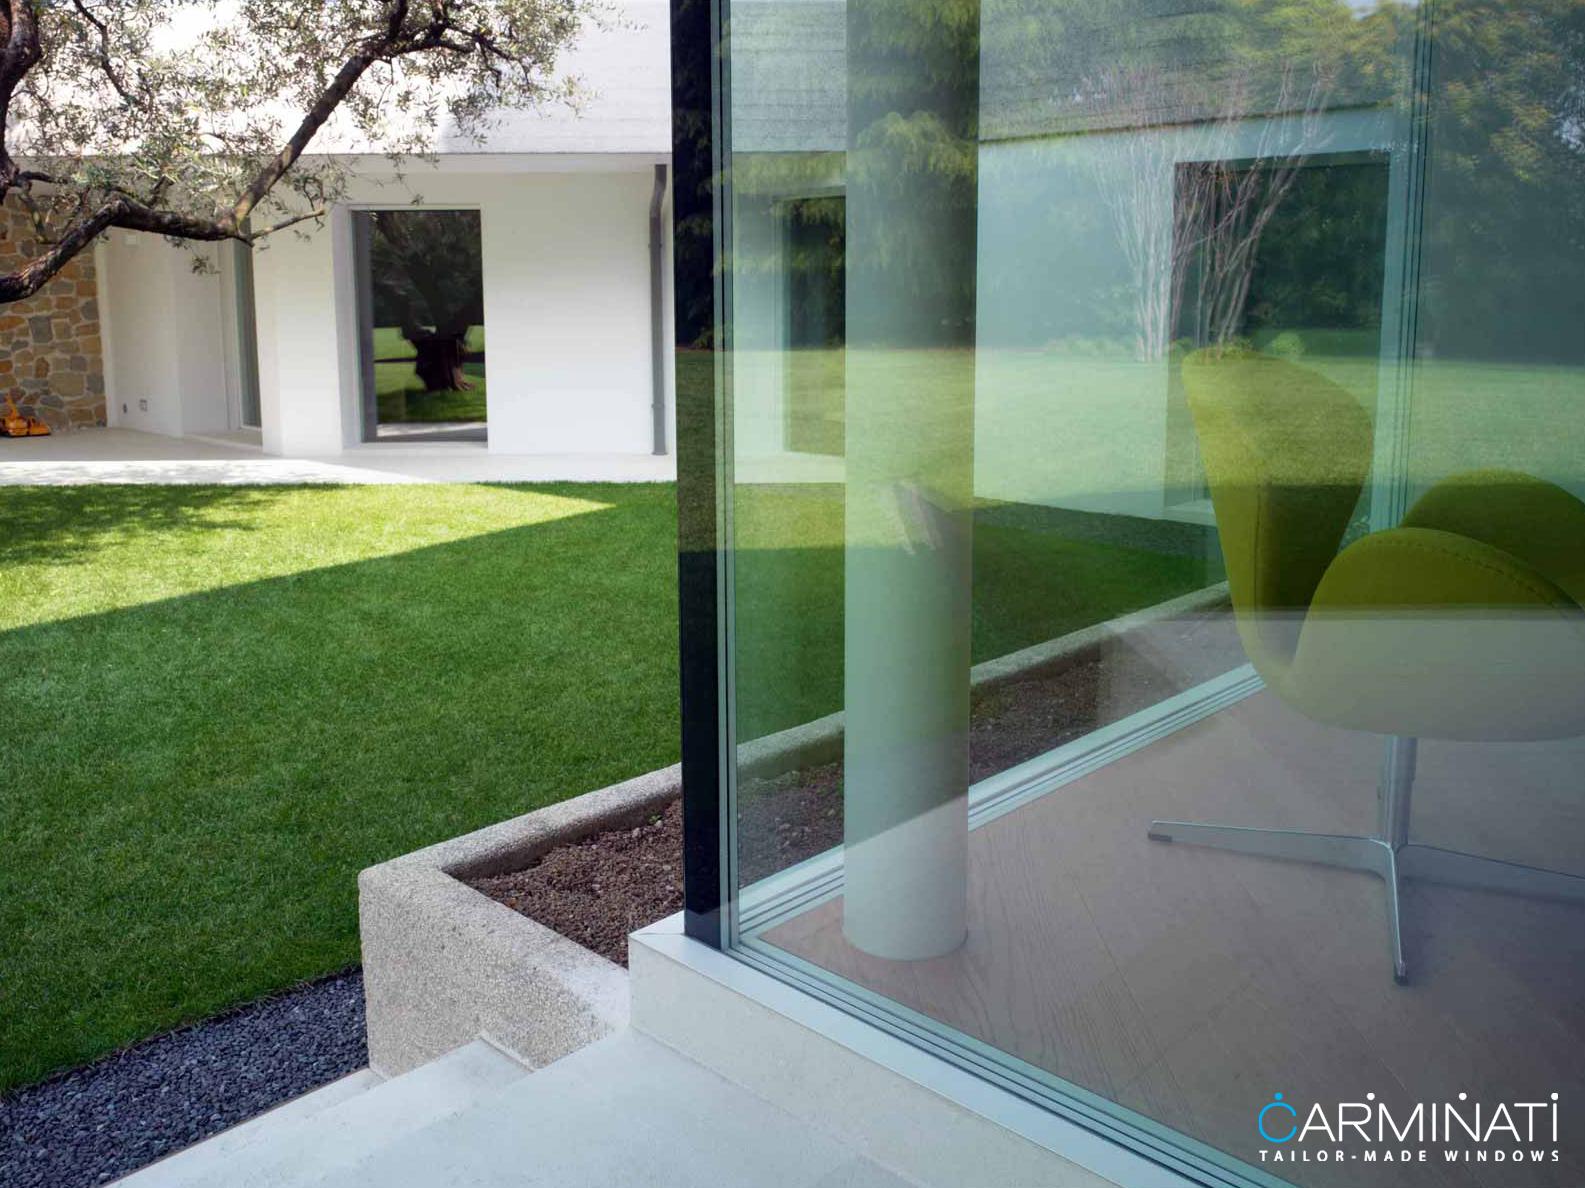 Natural lights fills this contemporary home through an expansive minimal frame glass corner meet window